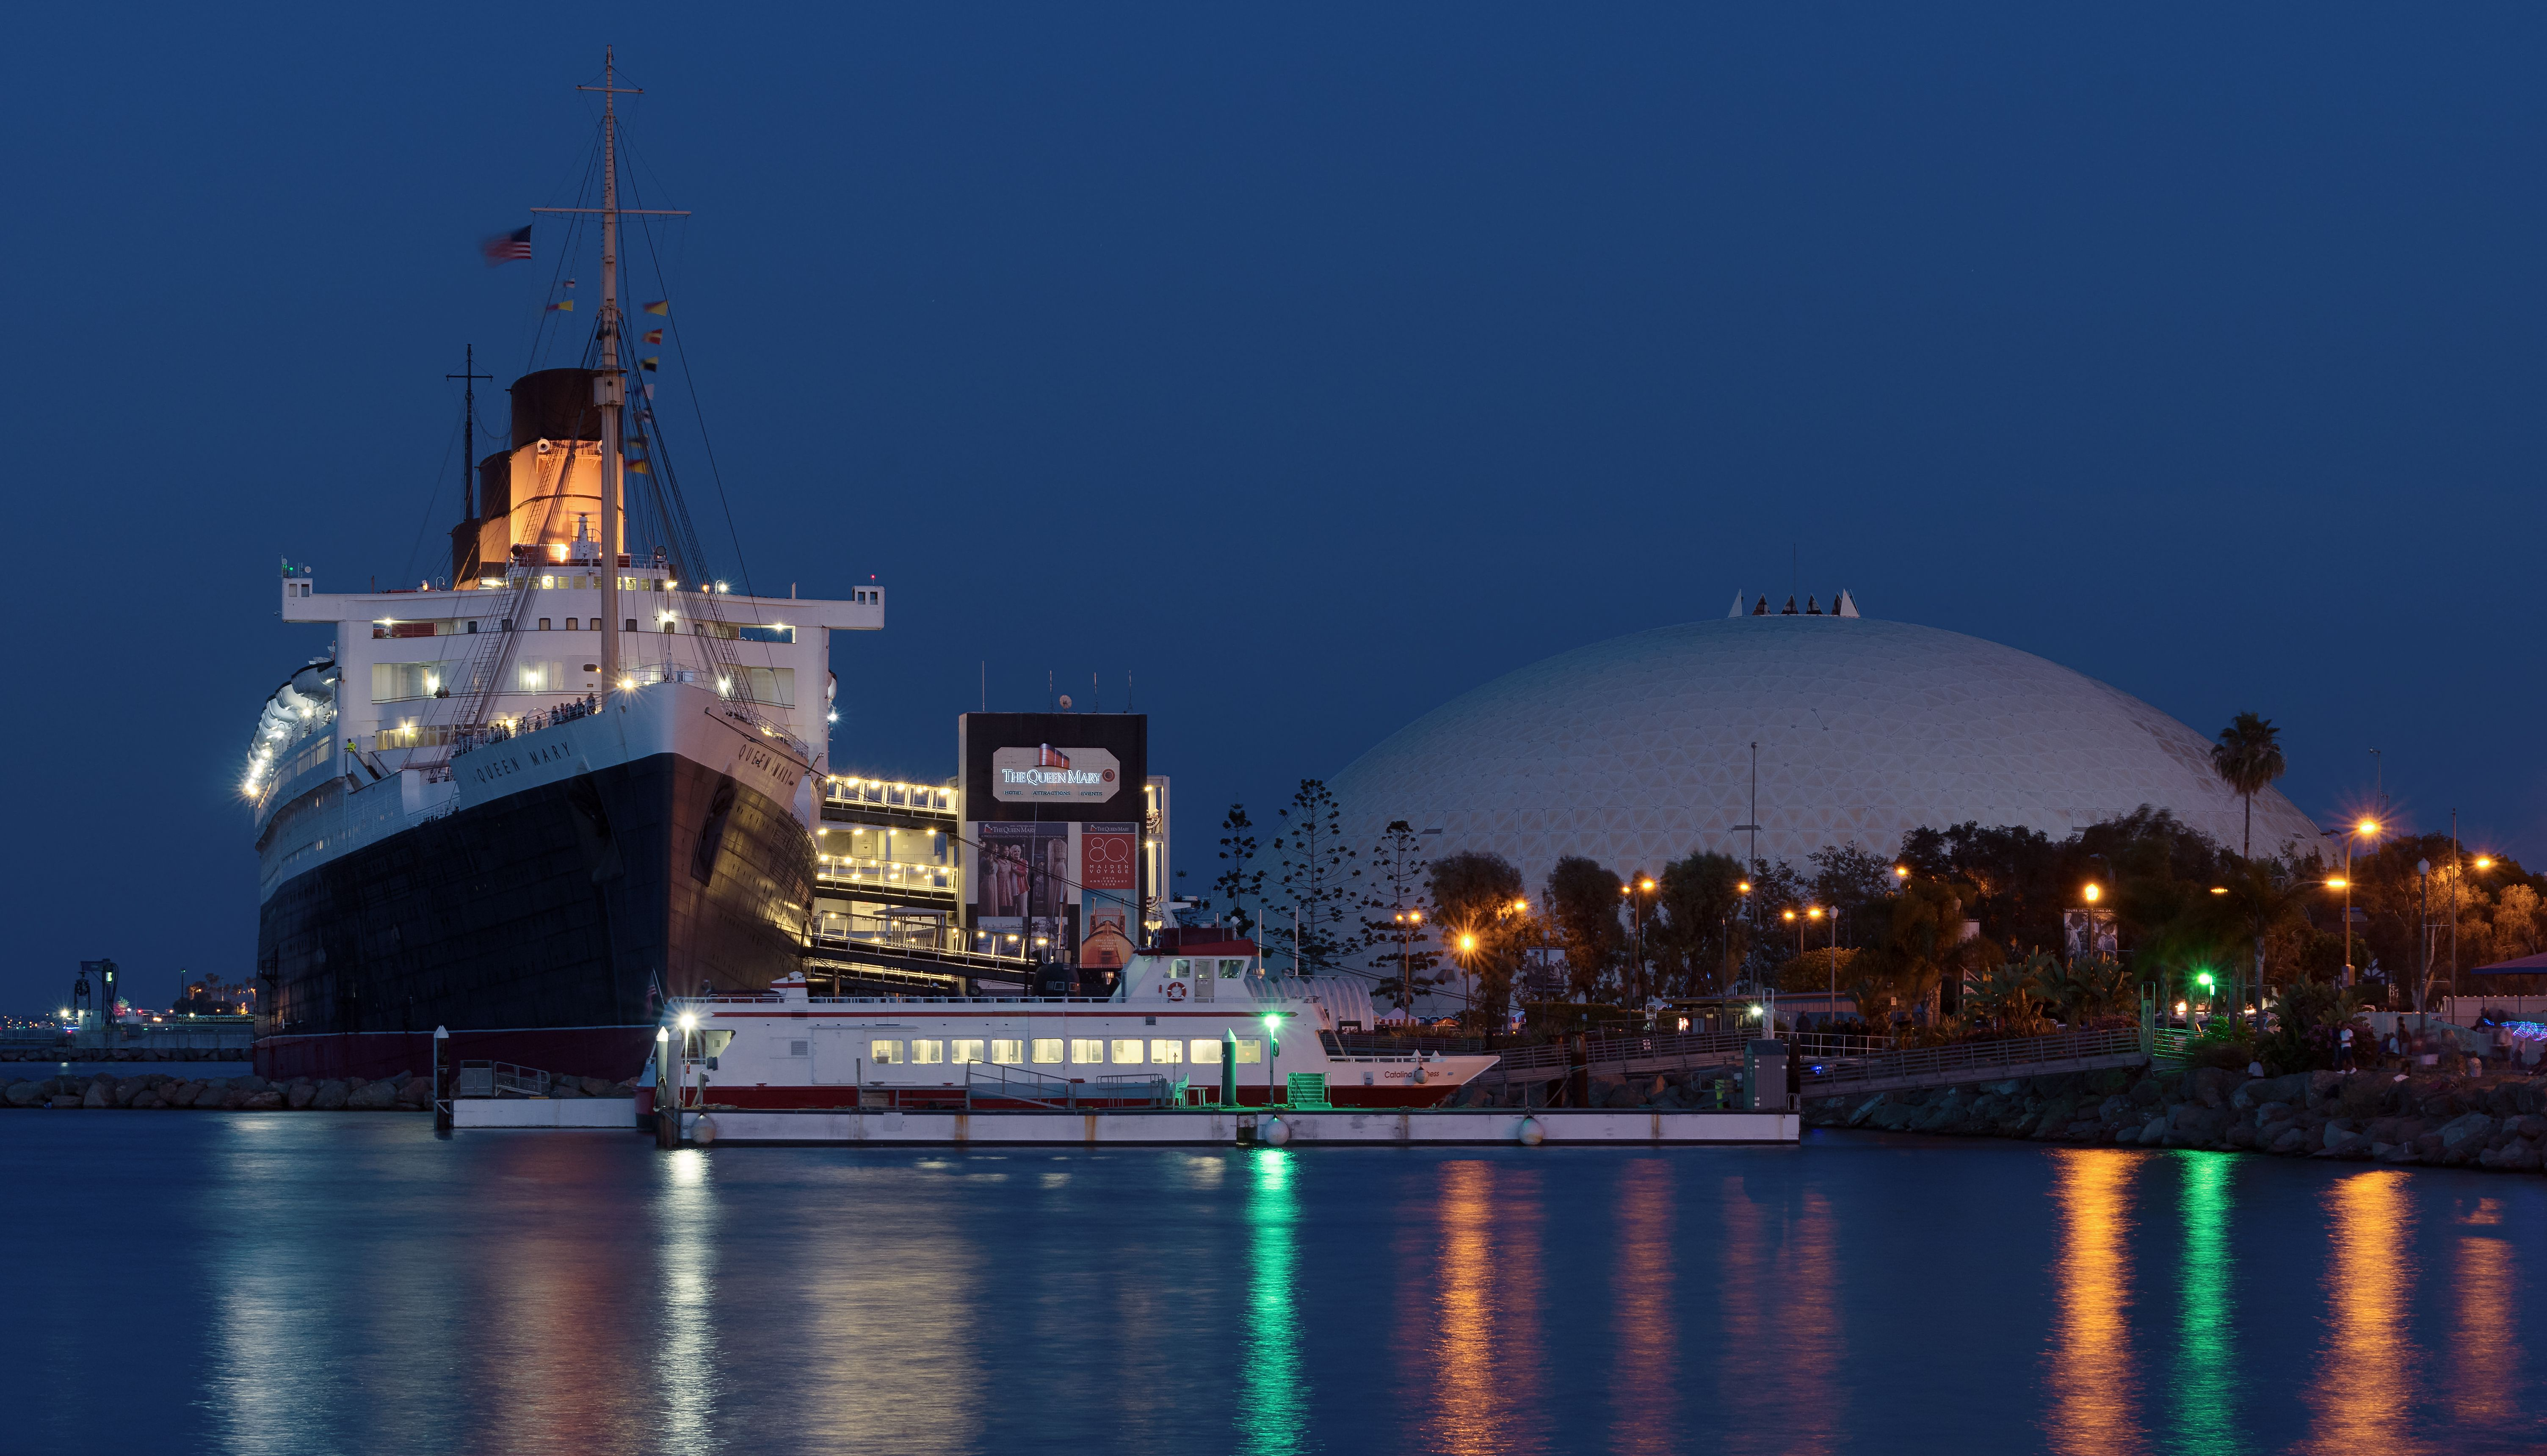 RMS Queen Mary Ocean an Dome in Long Beach